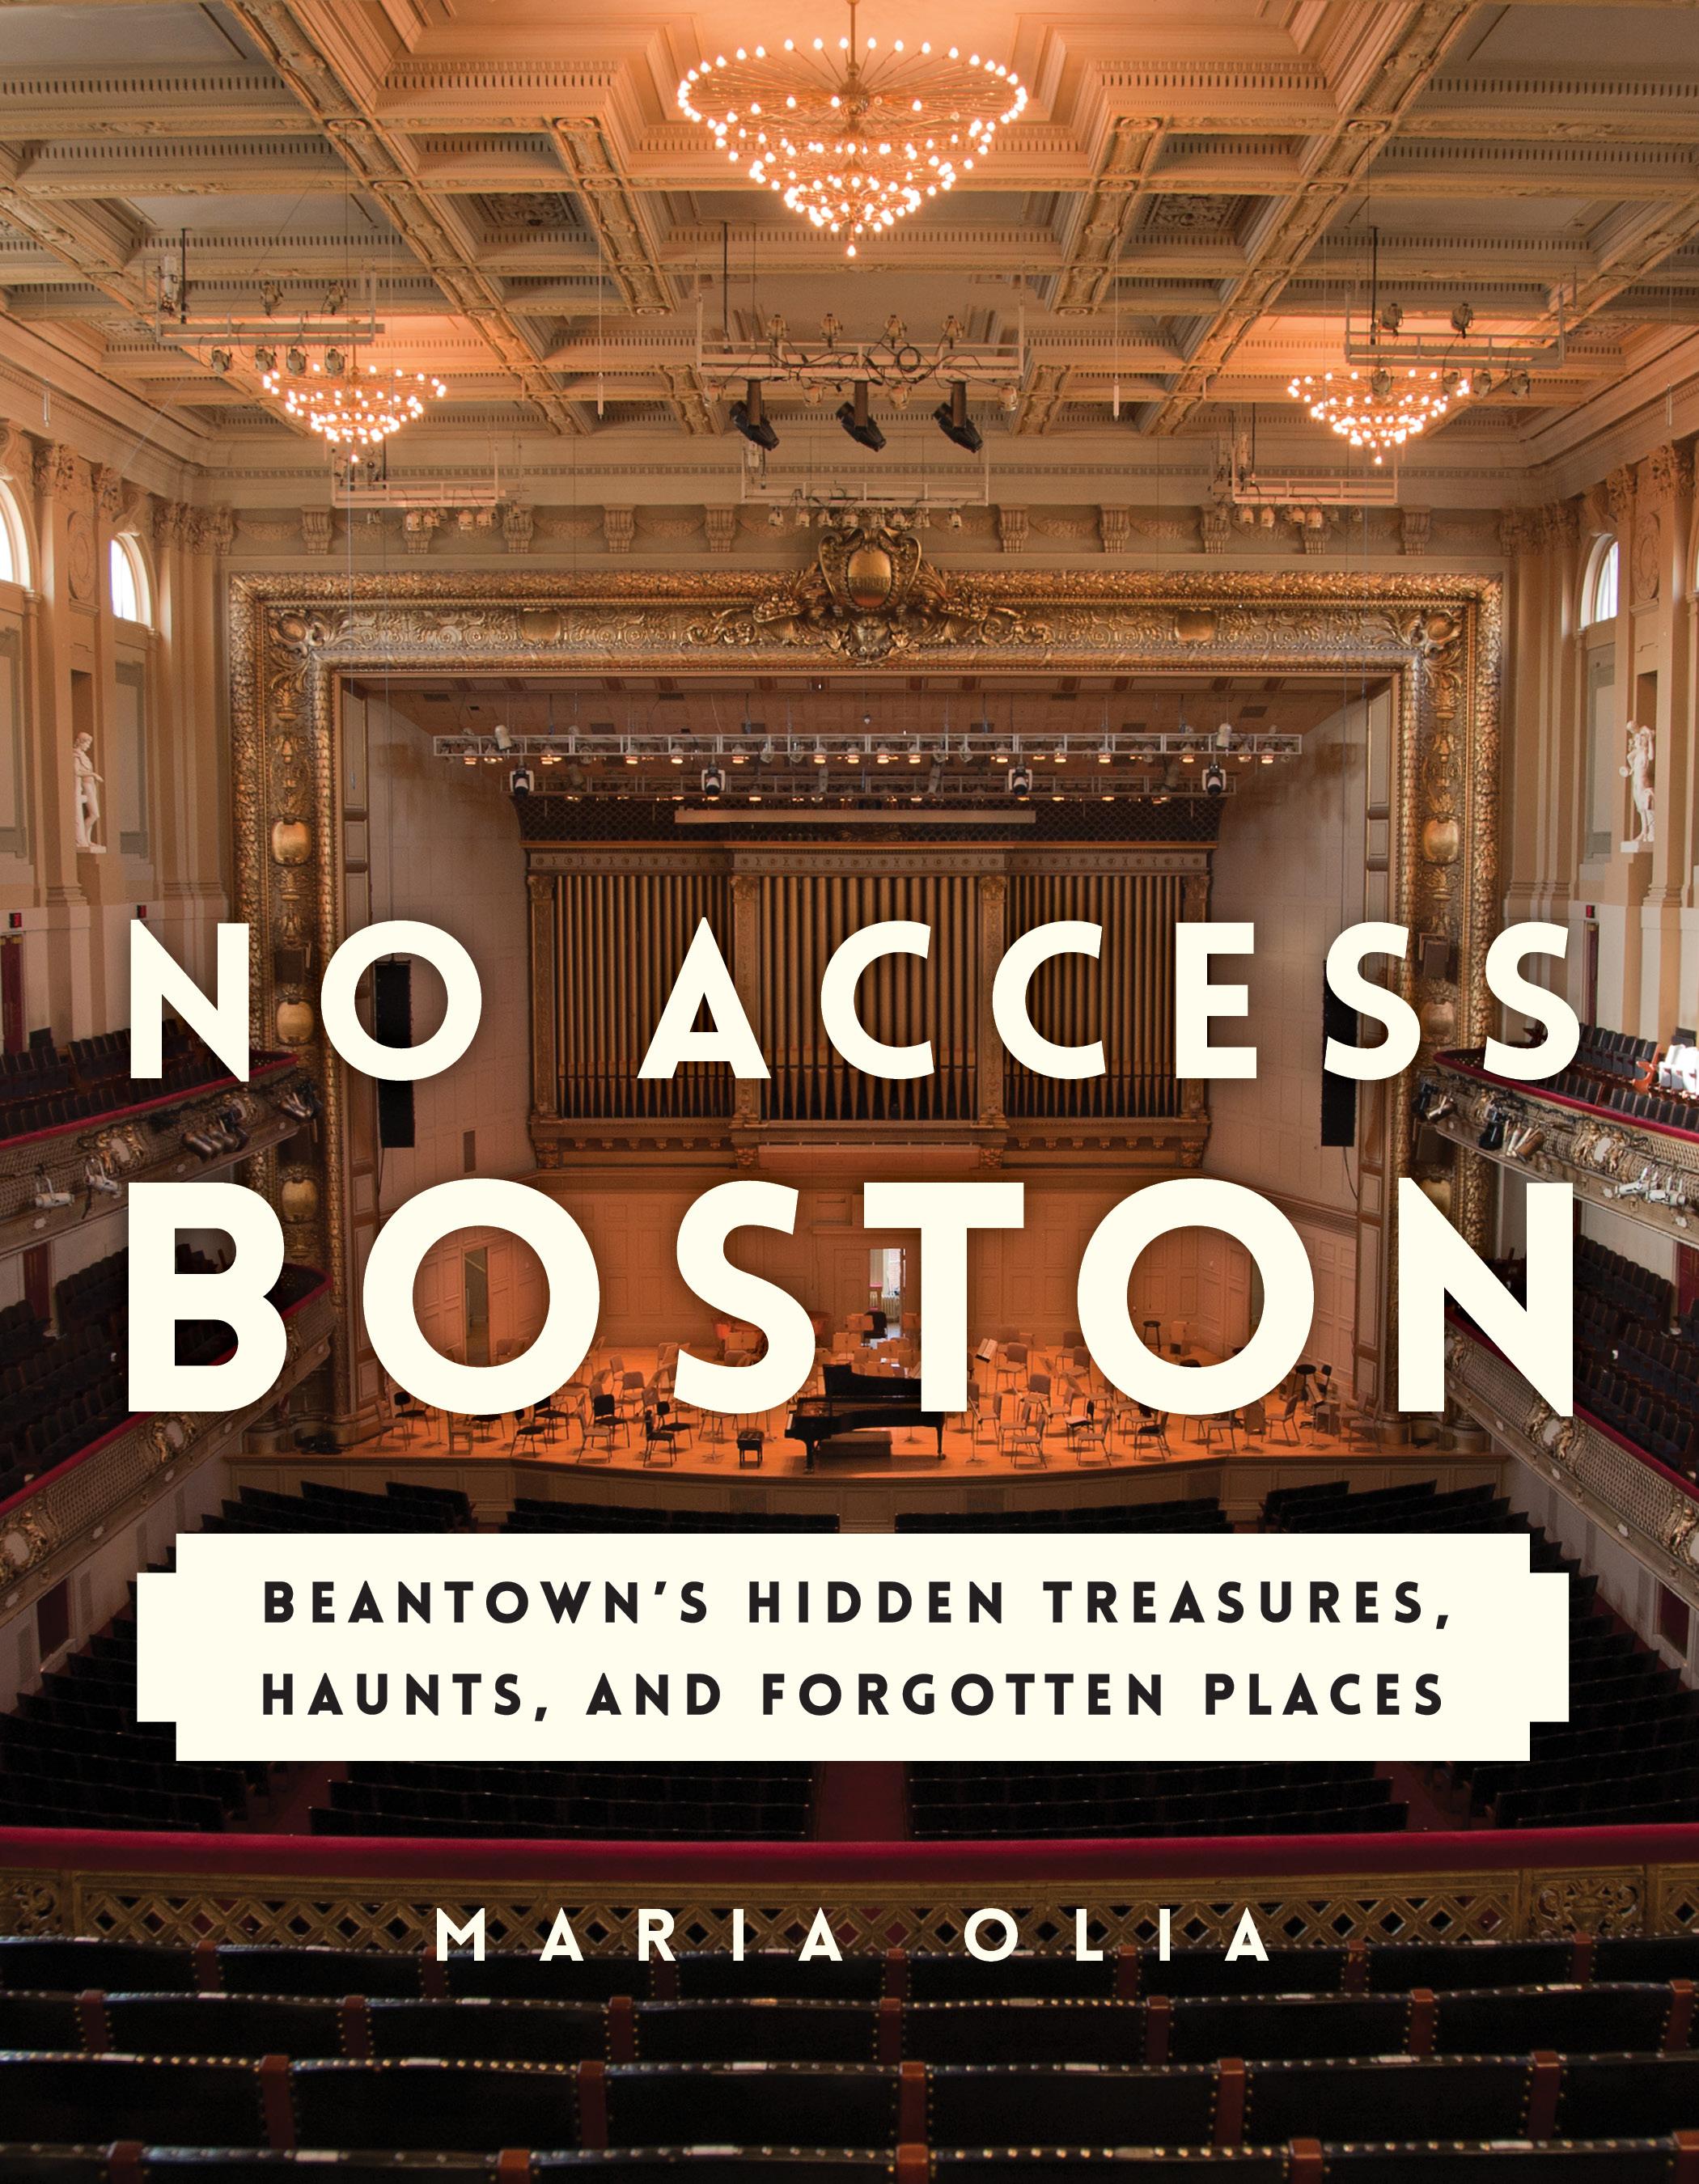 no access boston.jpg